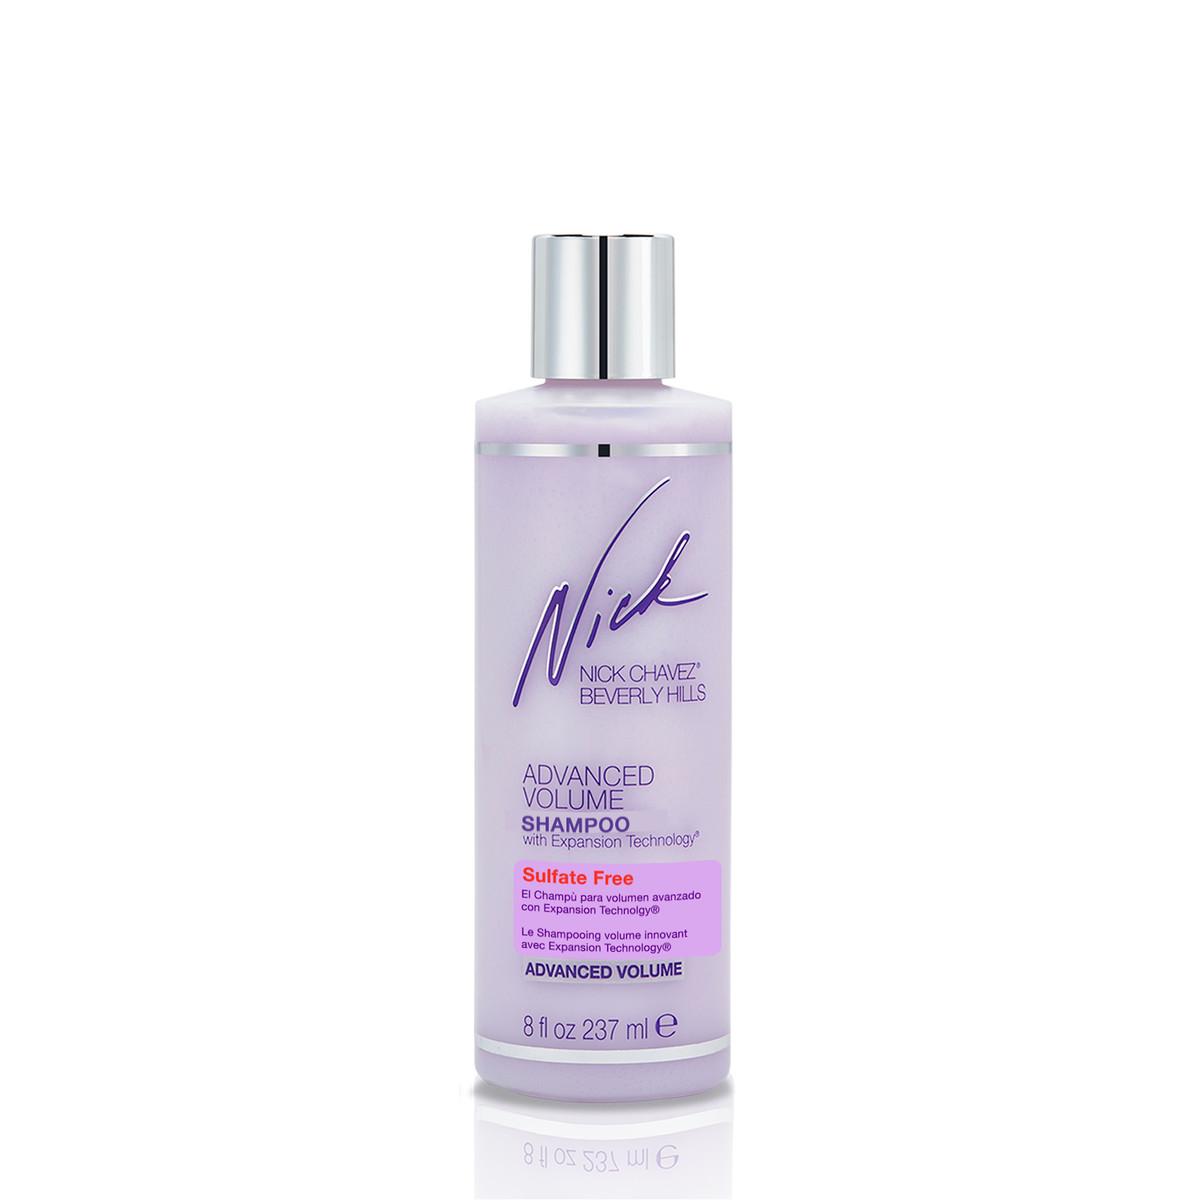 8oz Advanced Volume Sulfate Free Shampoo